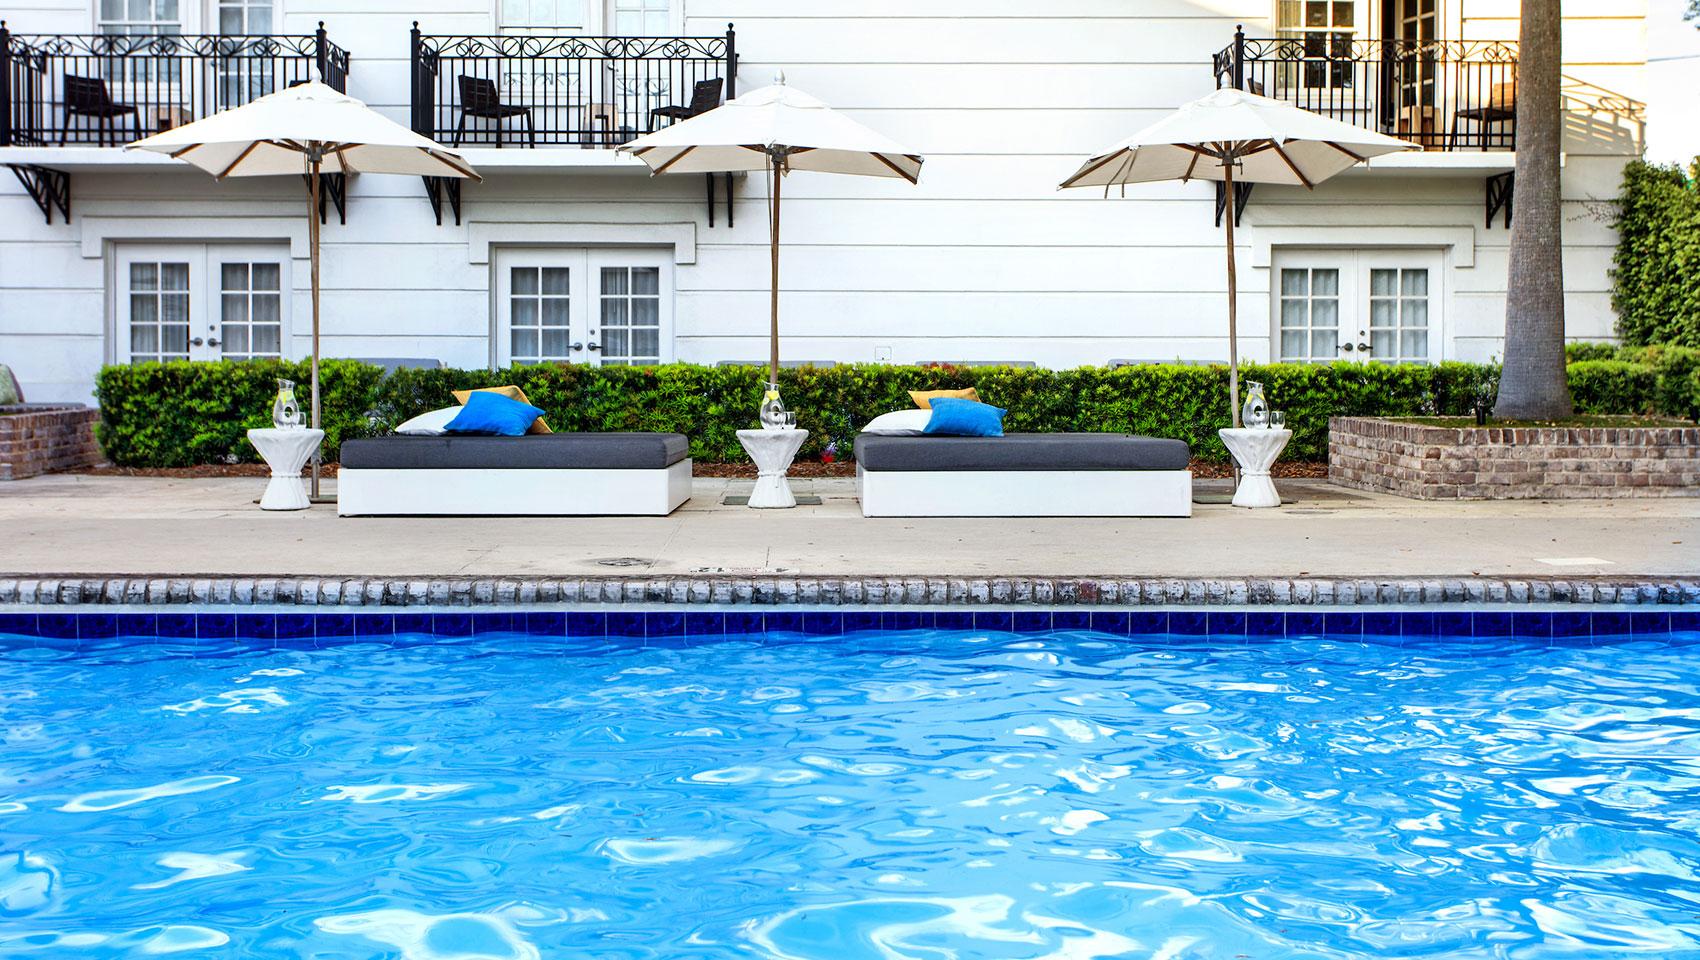 Savannah Ga With An Outdoor Pool